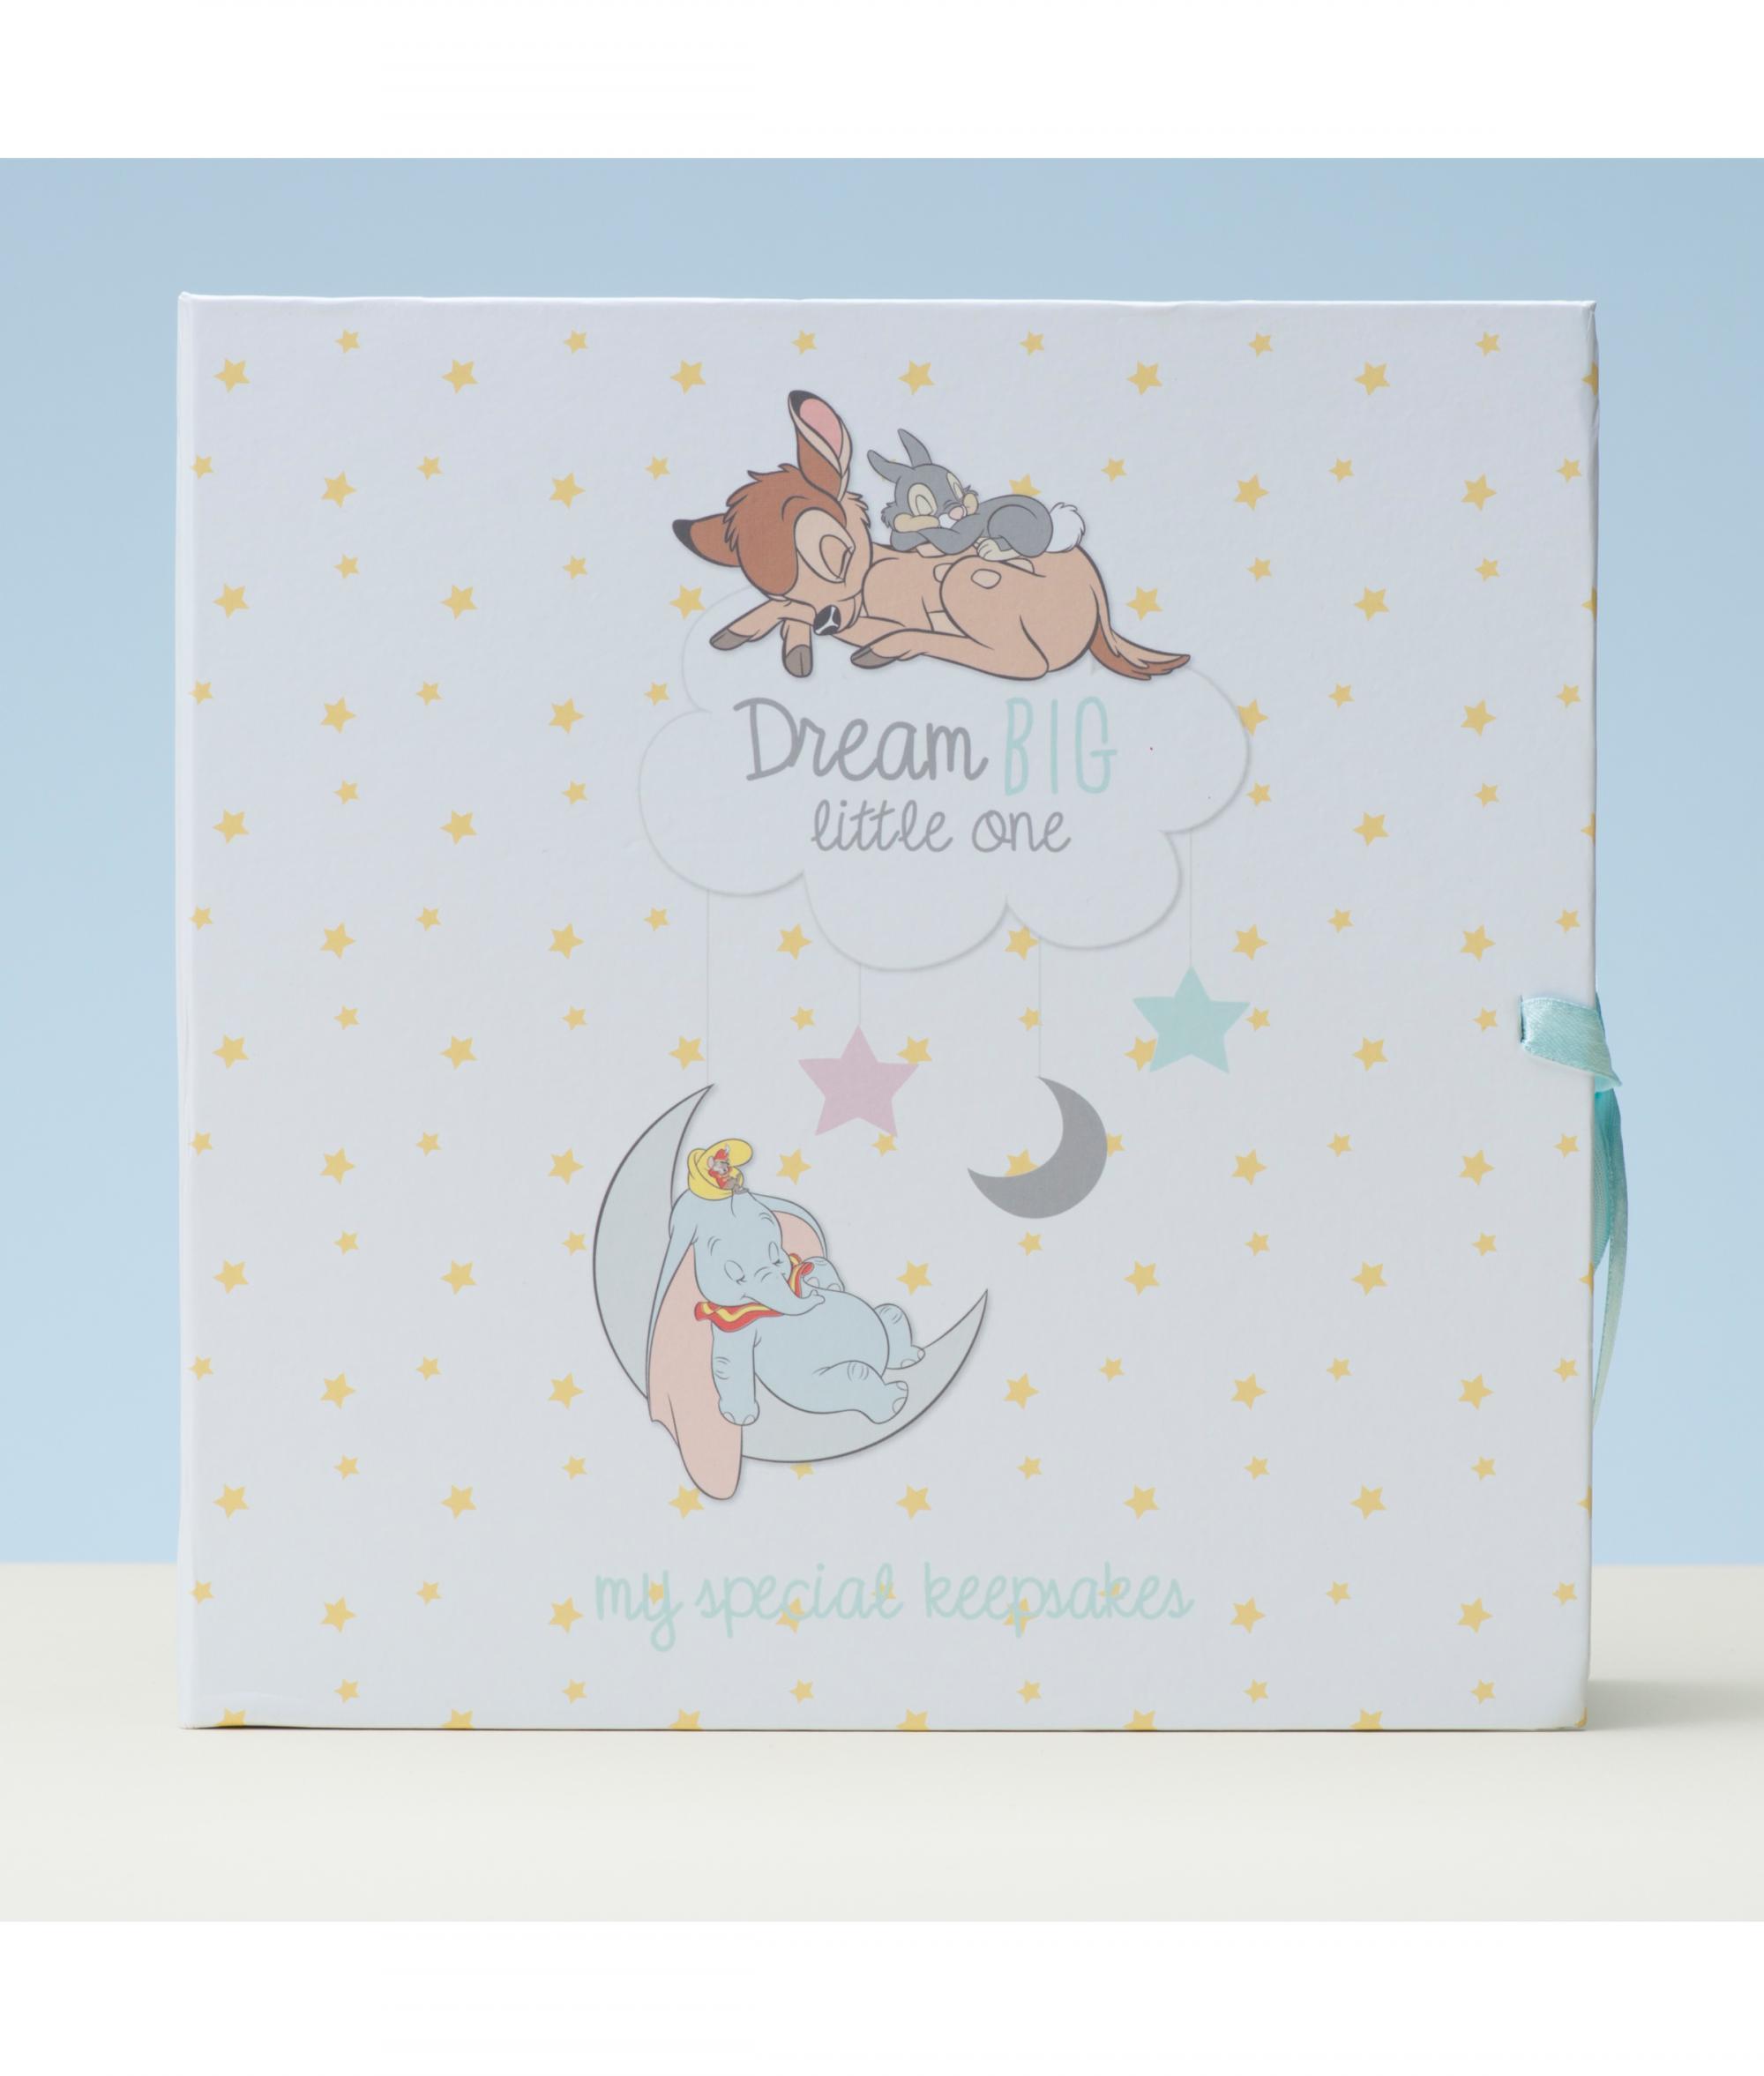 Disney Baby Gifts Uk : Disney magical beginnings keepsake box research